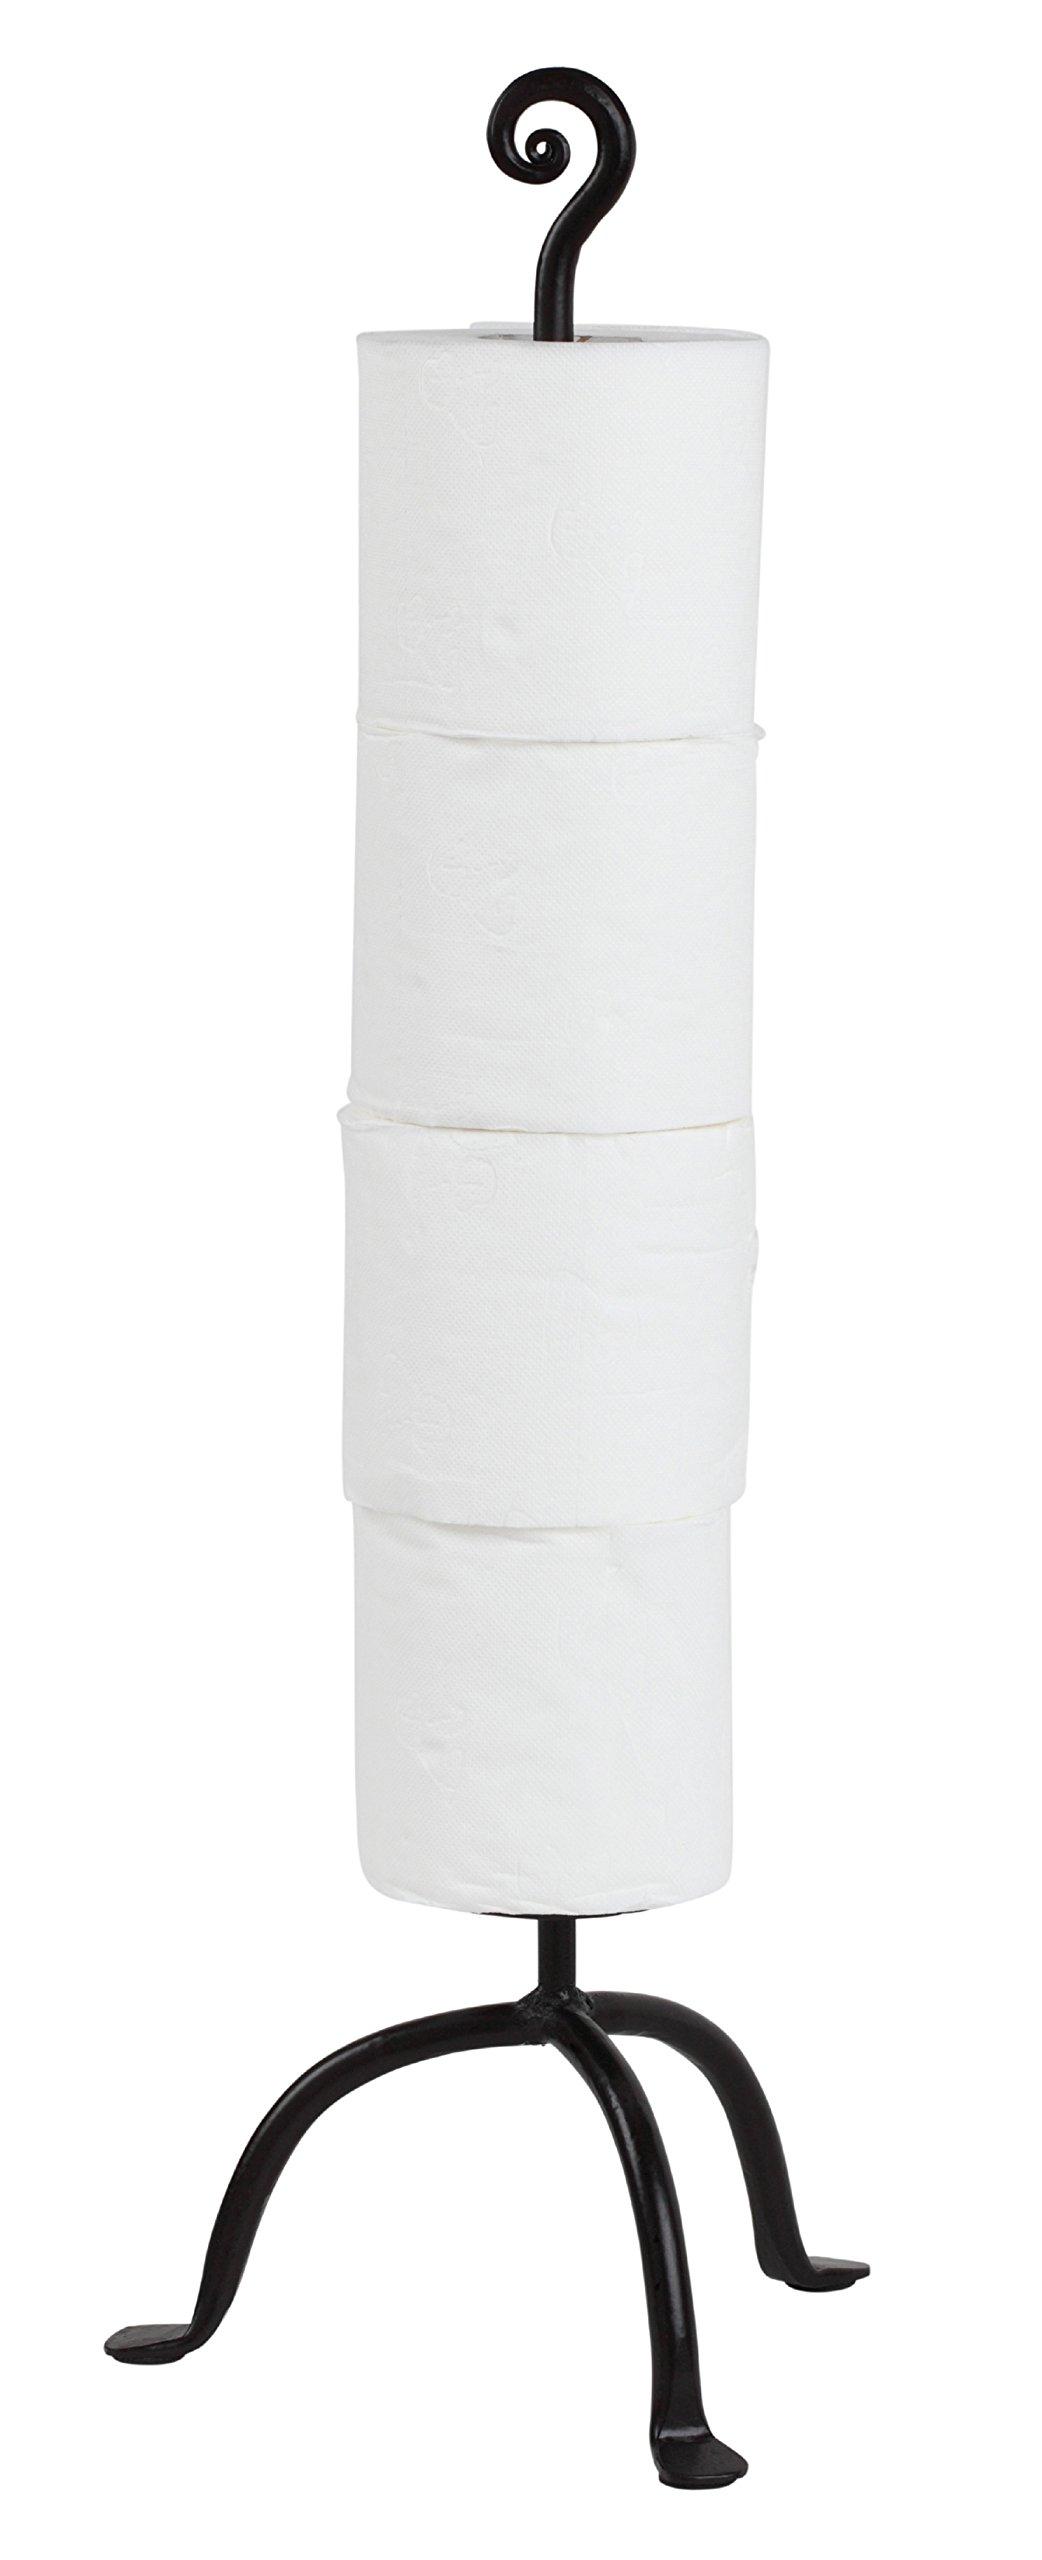 RTZEN Wrought Iron Swirl 4 Rolls Storage Toilet Paper Stand | Free Standing TP | Handcrafted Décor